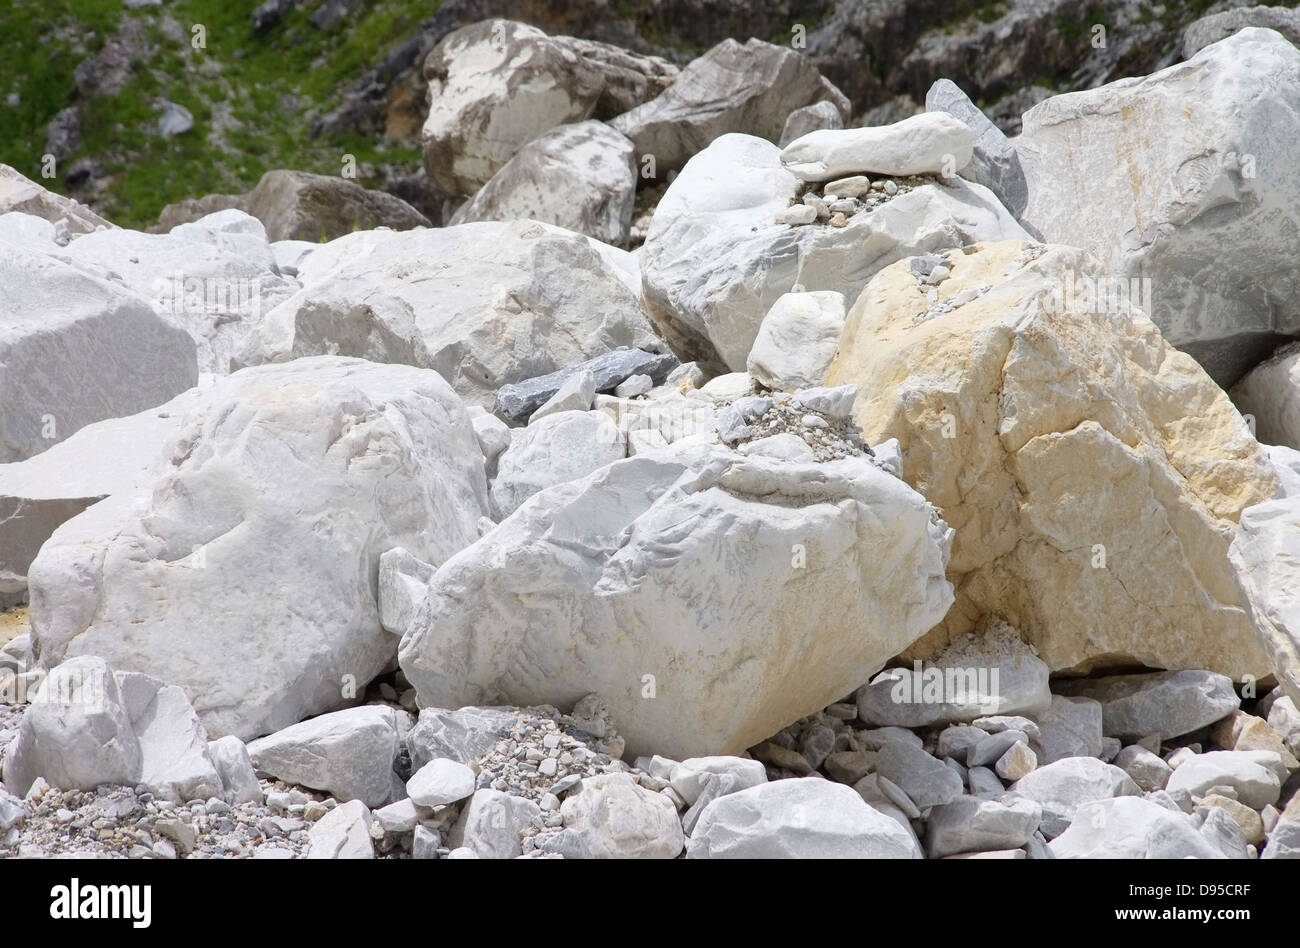 Carrara Marmor carrara marmor steinbruch carrara marble pit 25 stock photo